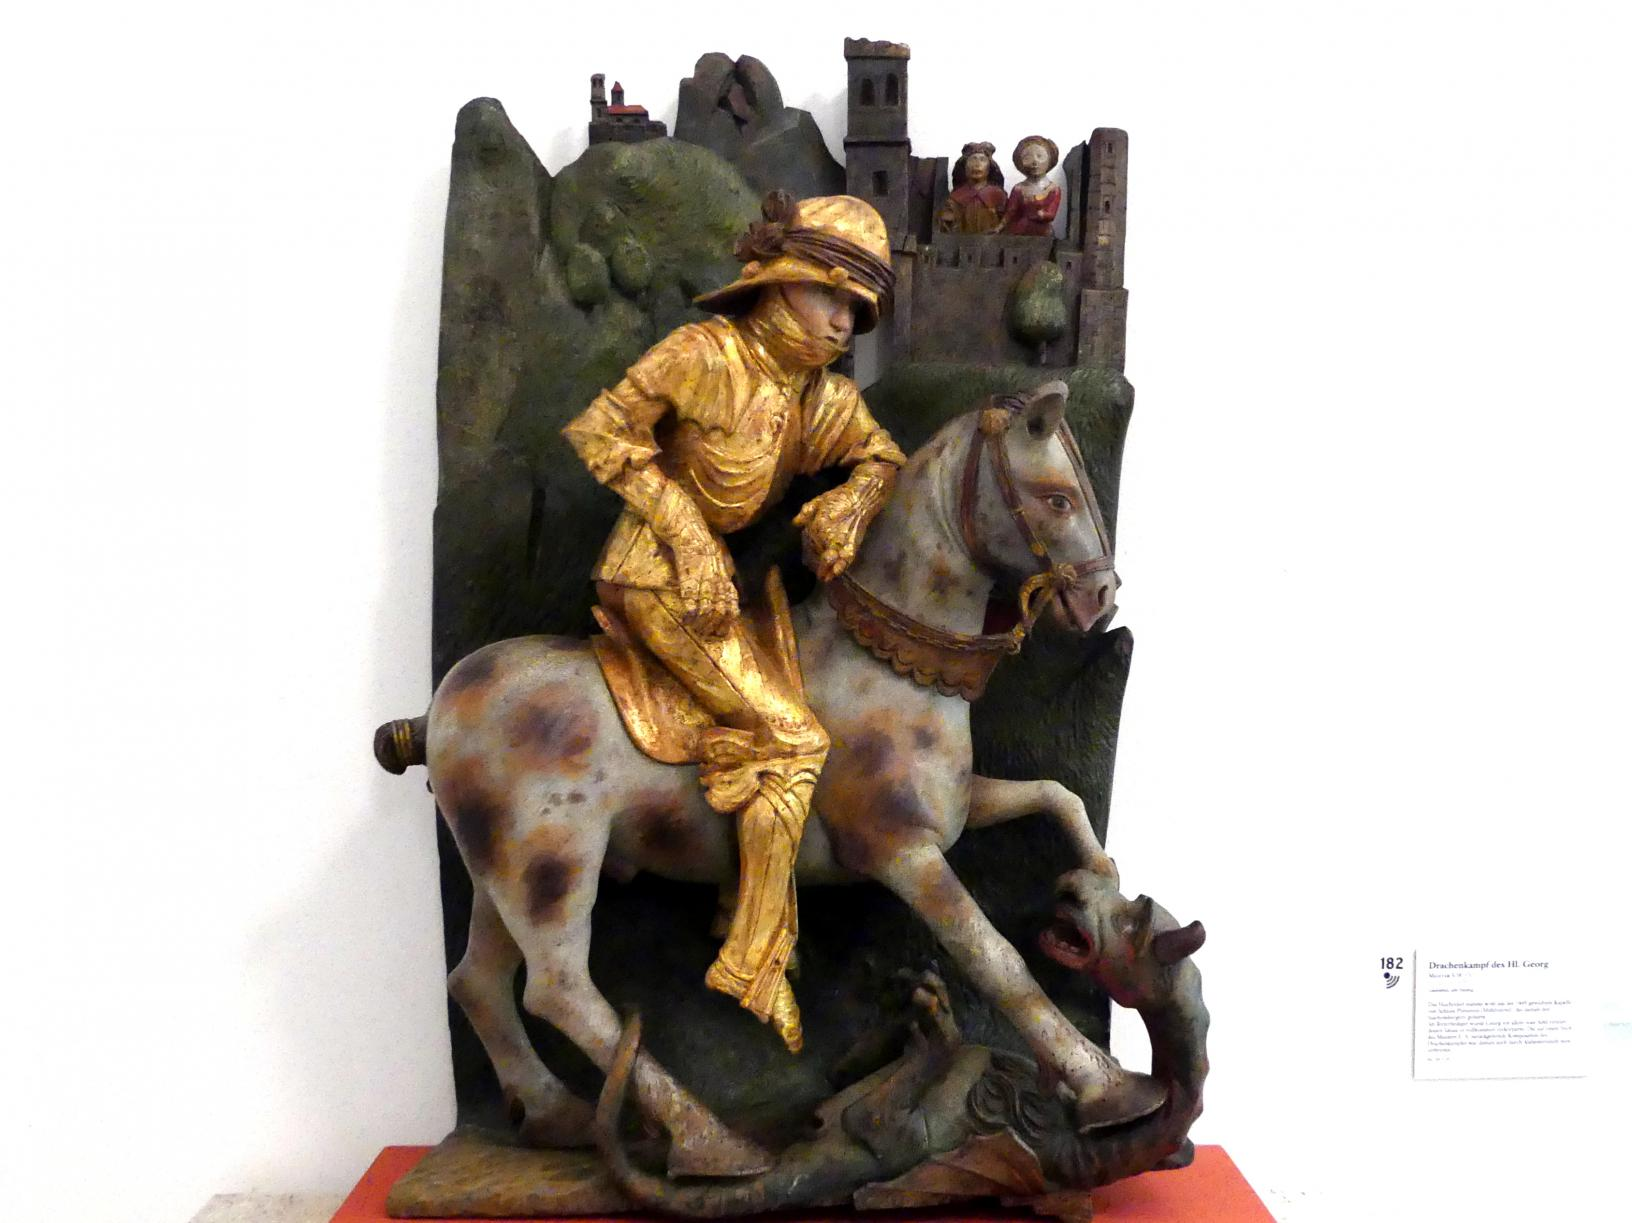 Drachenkampf des Hl. Georg, um 1499